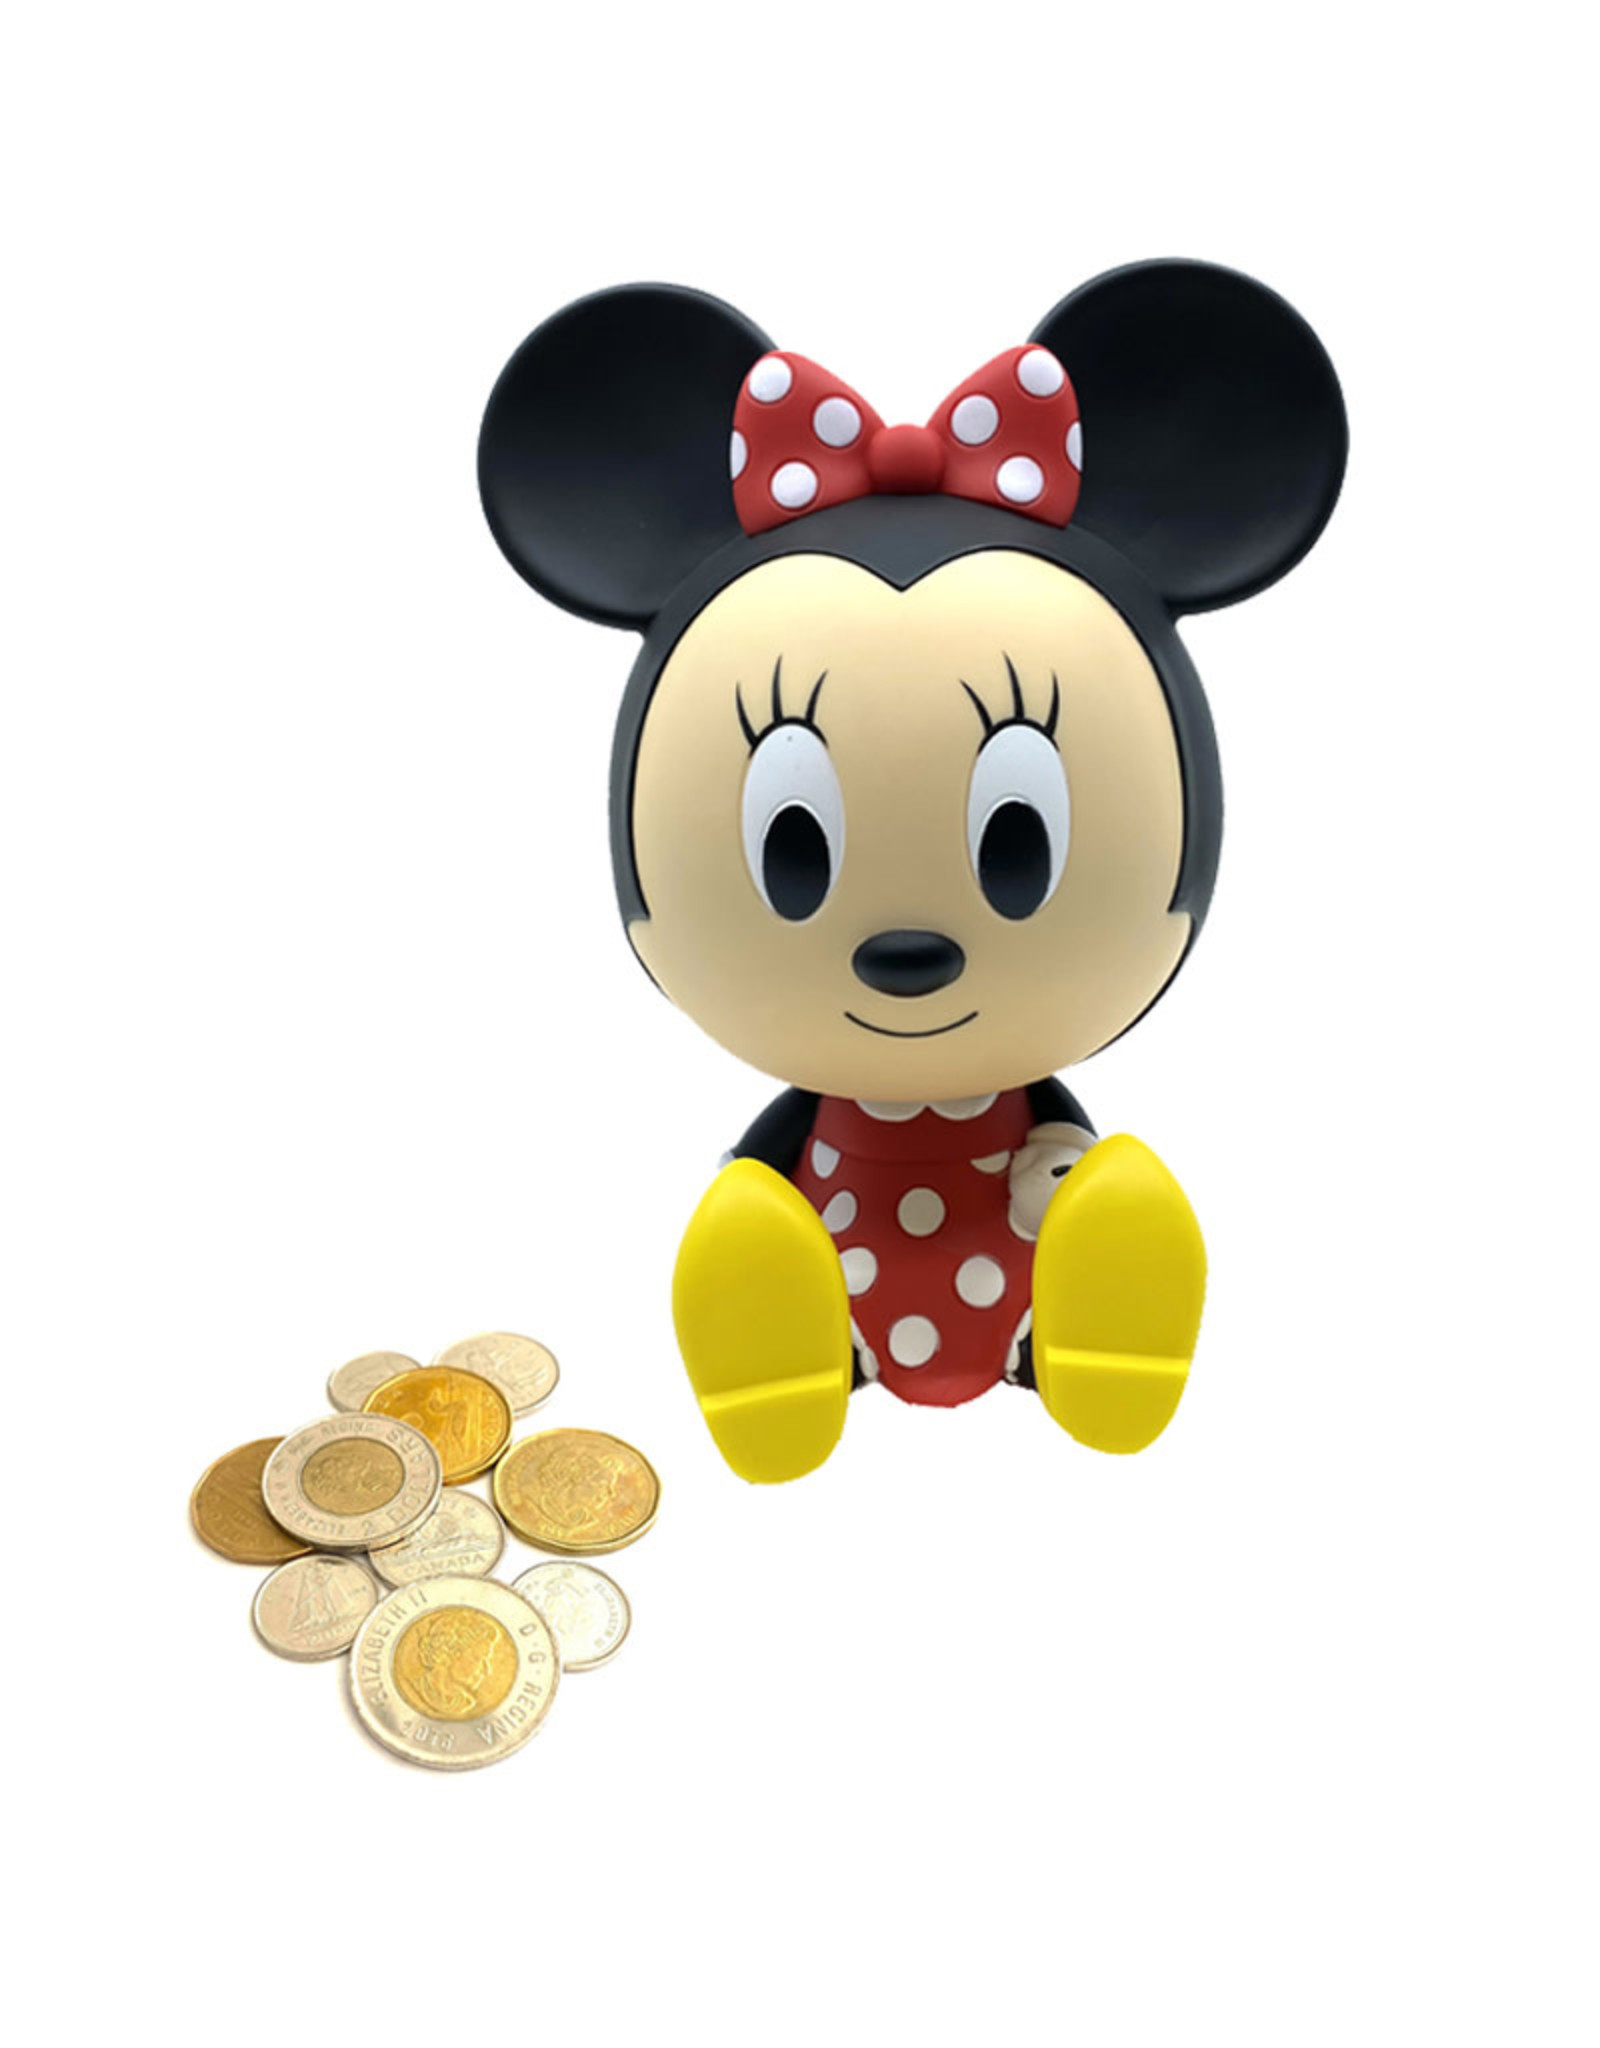 Disney Disney ( Bank ) Minnie